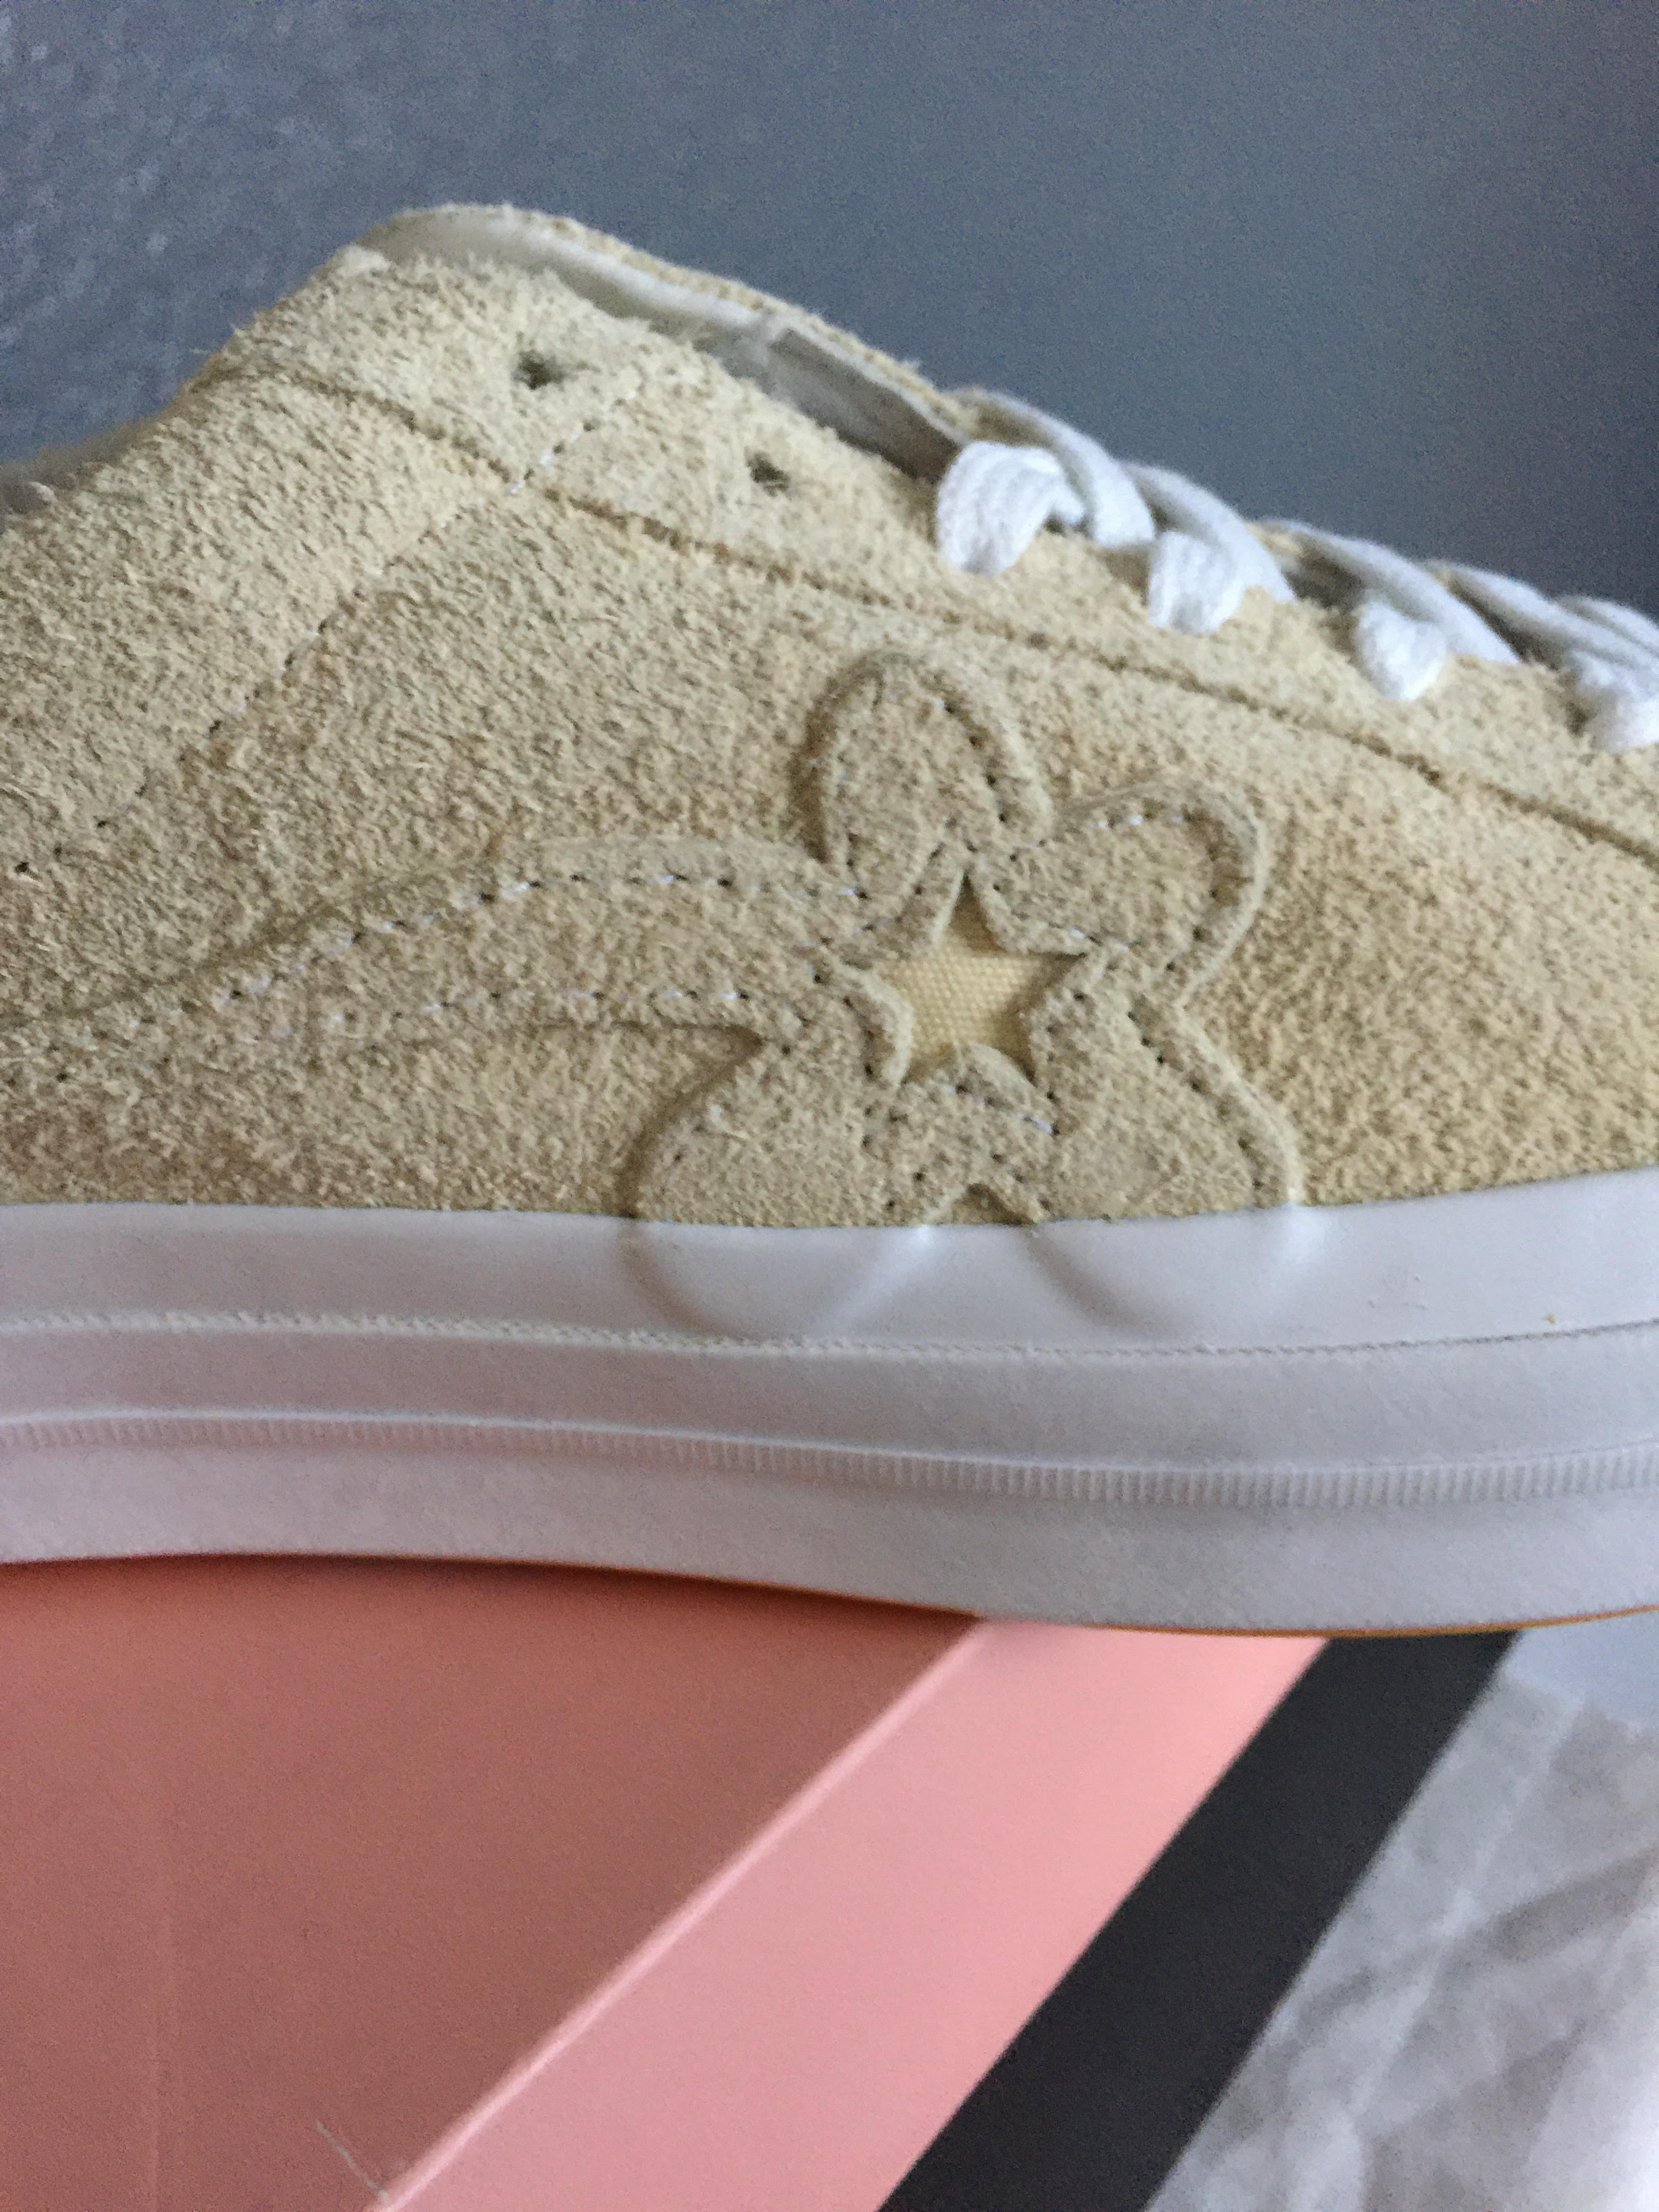 51cdd9ea80bc Converse Converse Golf le Fleur Size 8 - Low-Top Sneakers for Sale ...